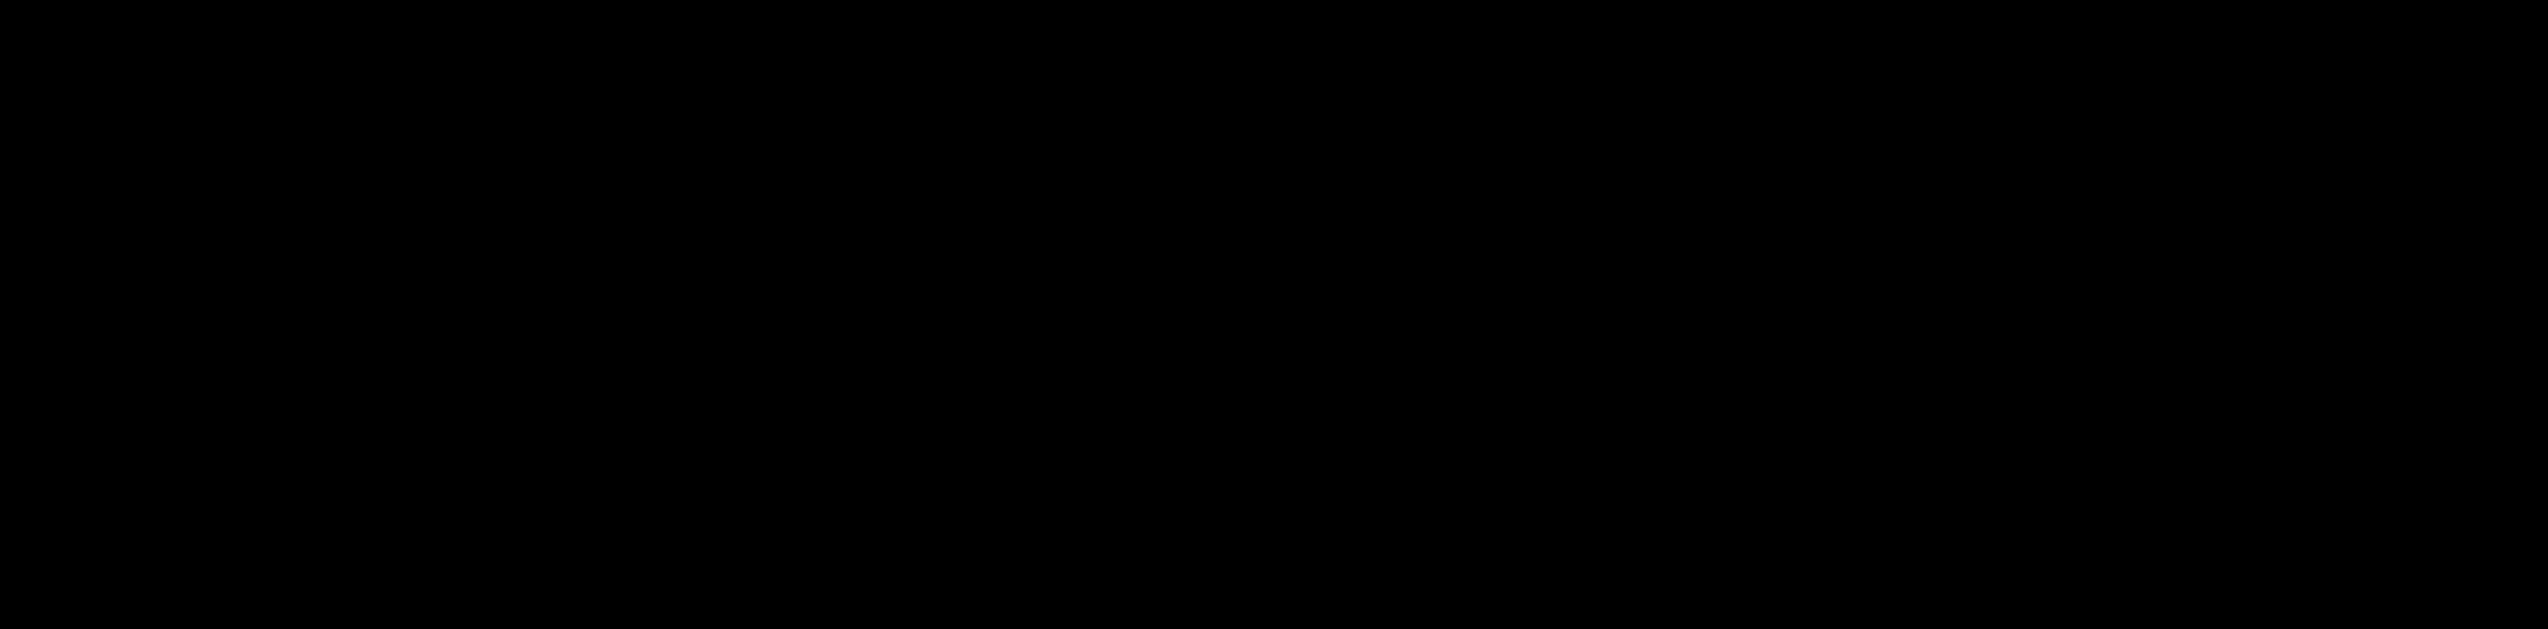 quinoa desc-06